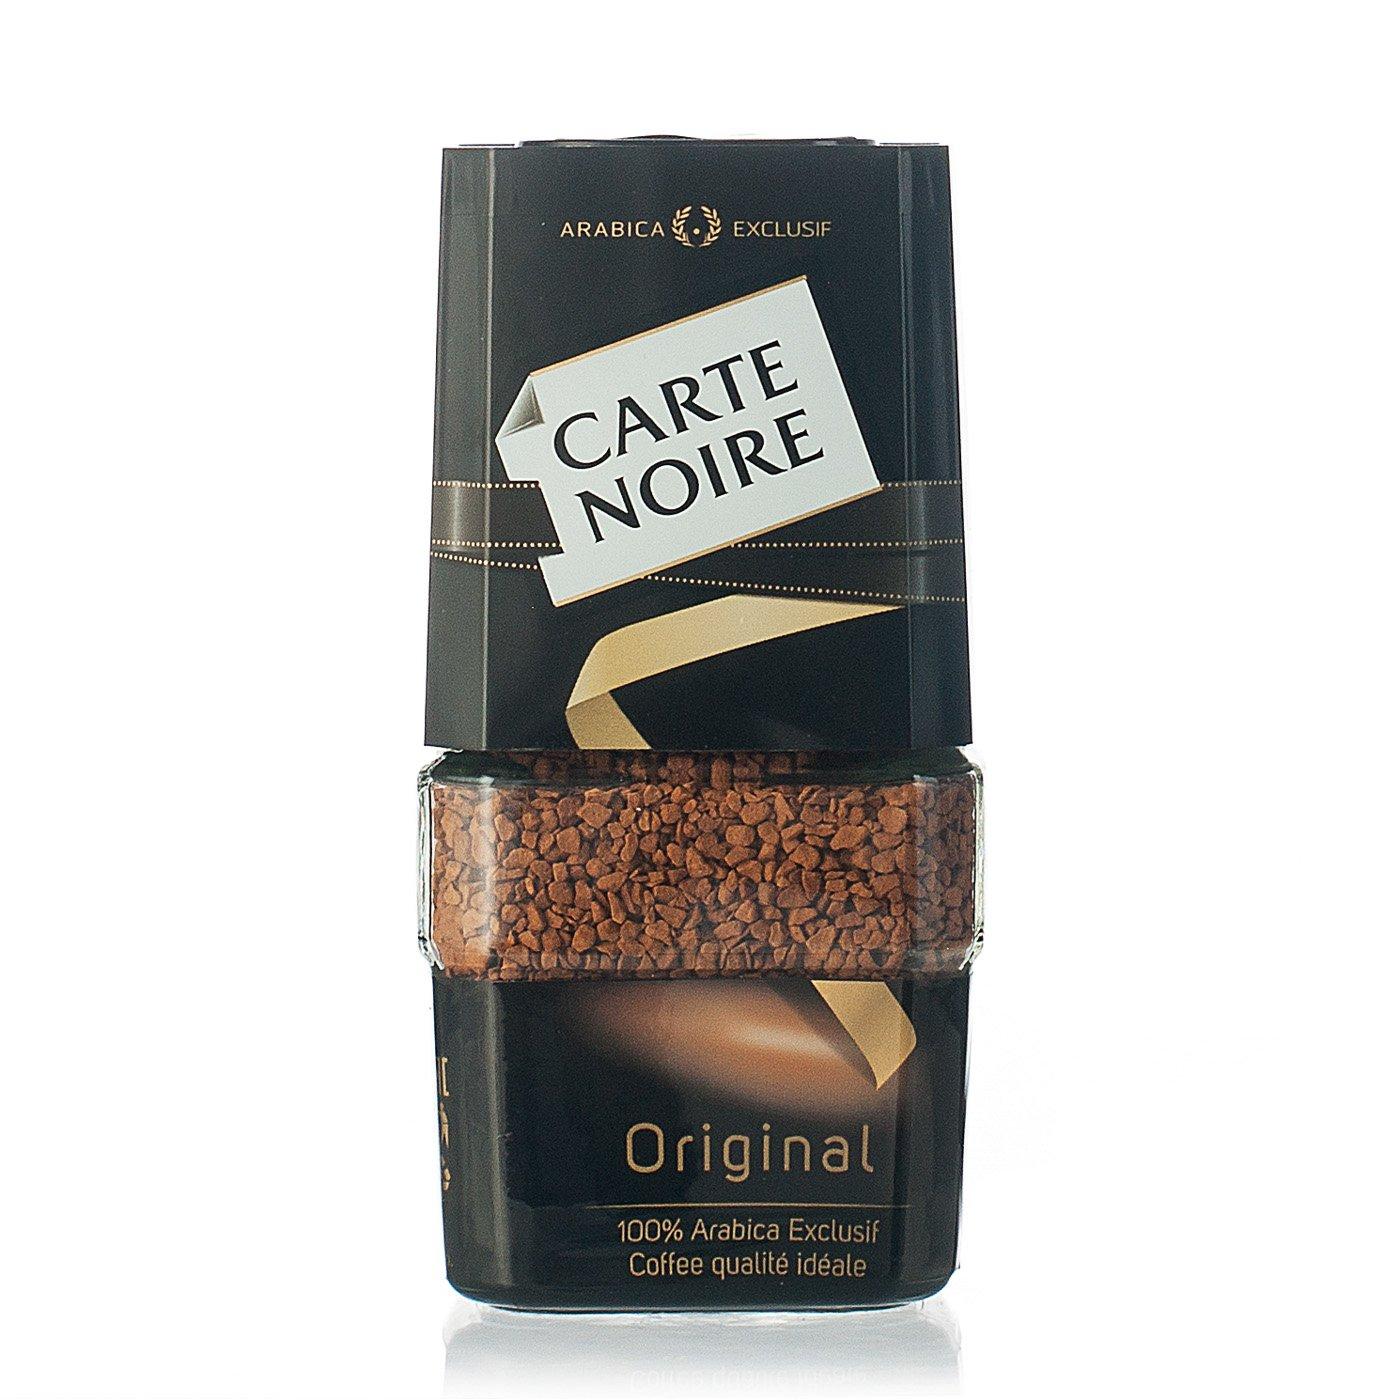 кофе карт нуар цена 95